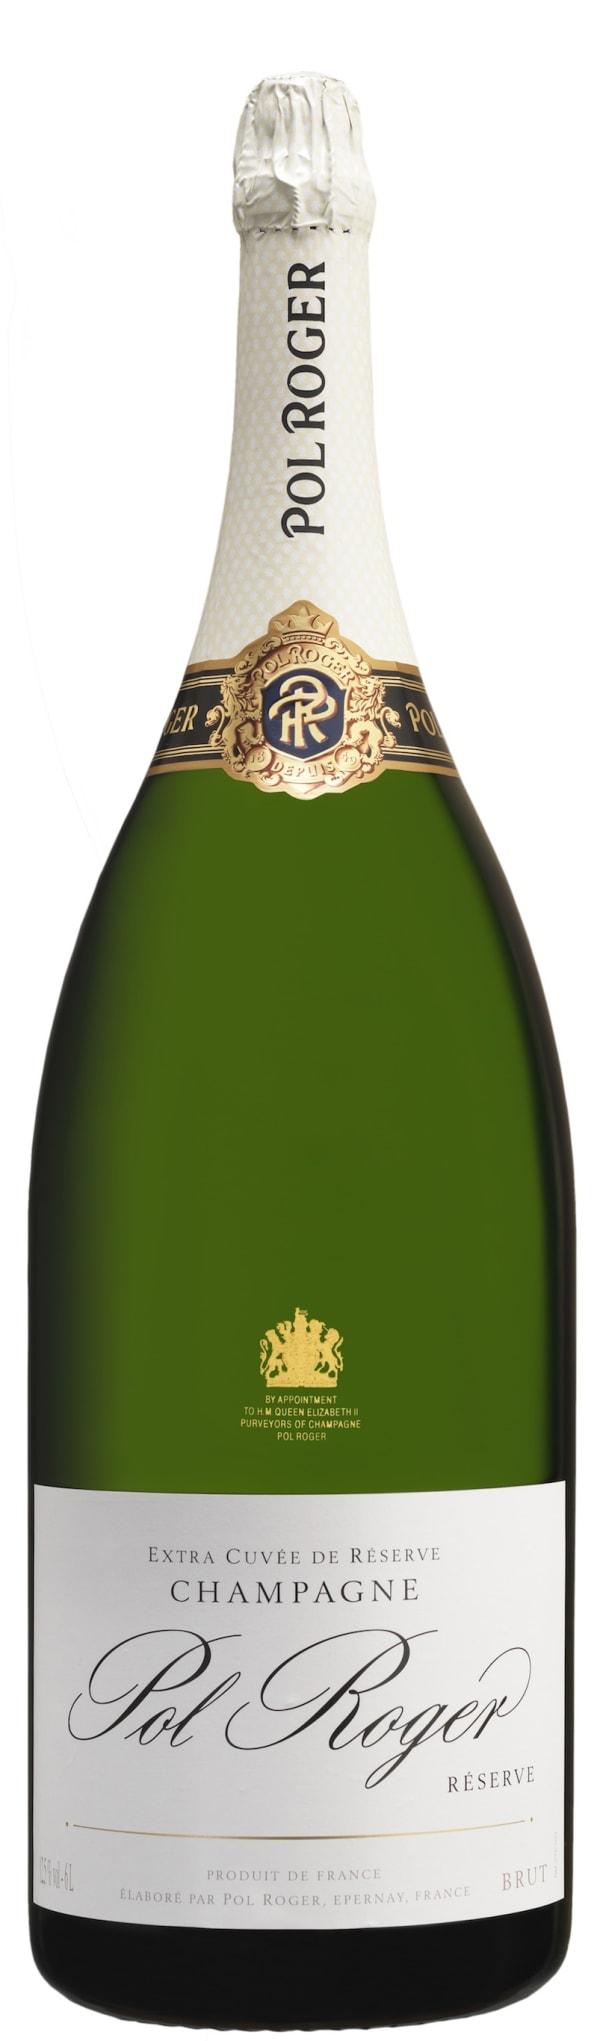 Pol Roger Réserve Champagne Brut Mathusalem